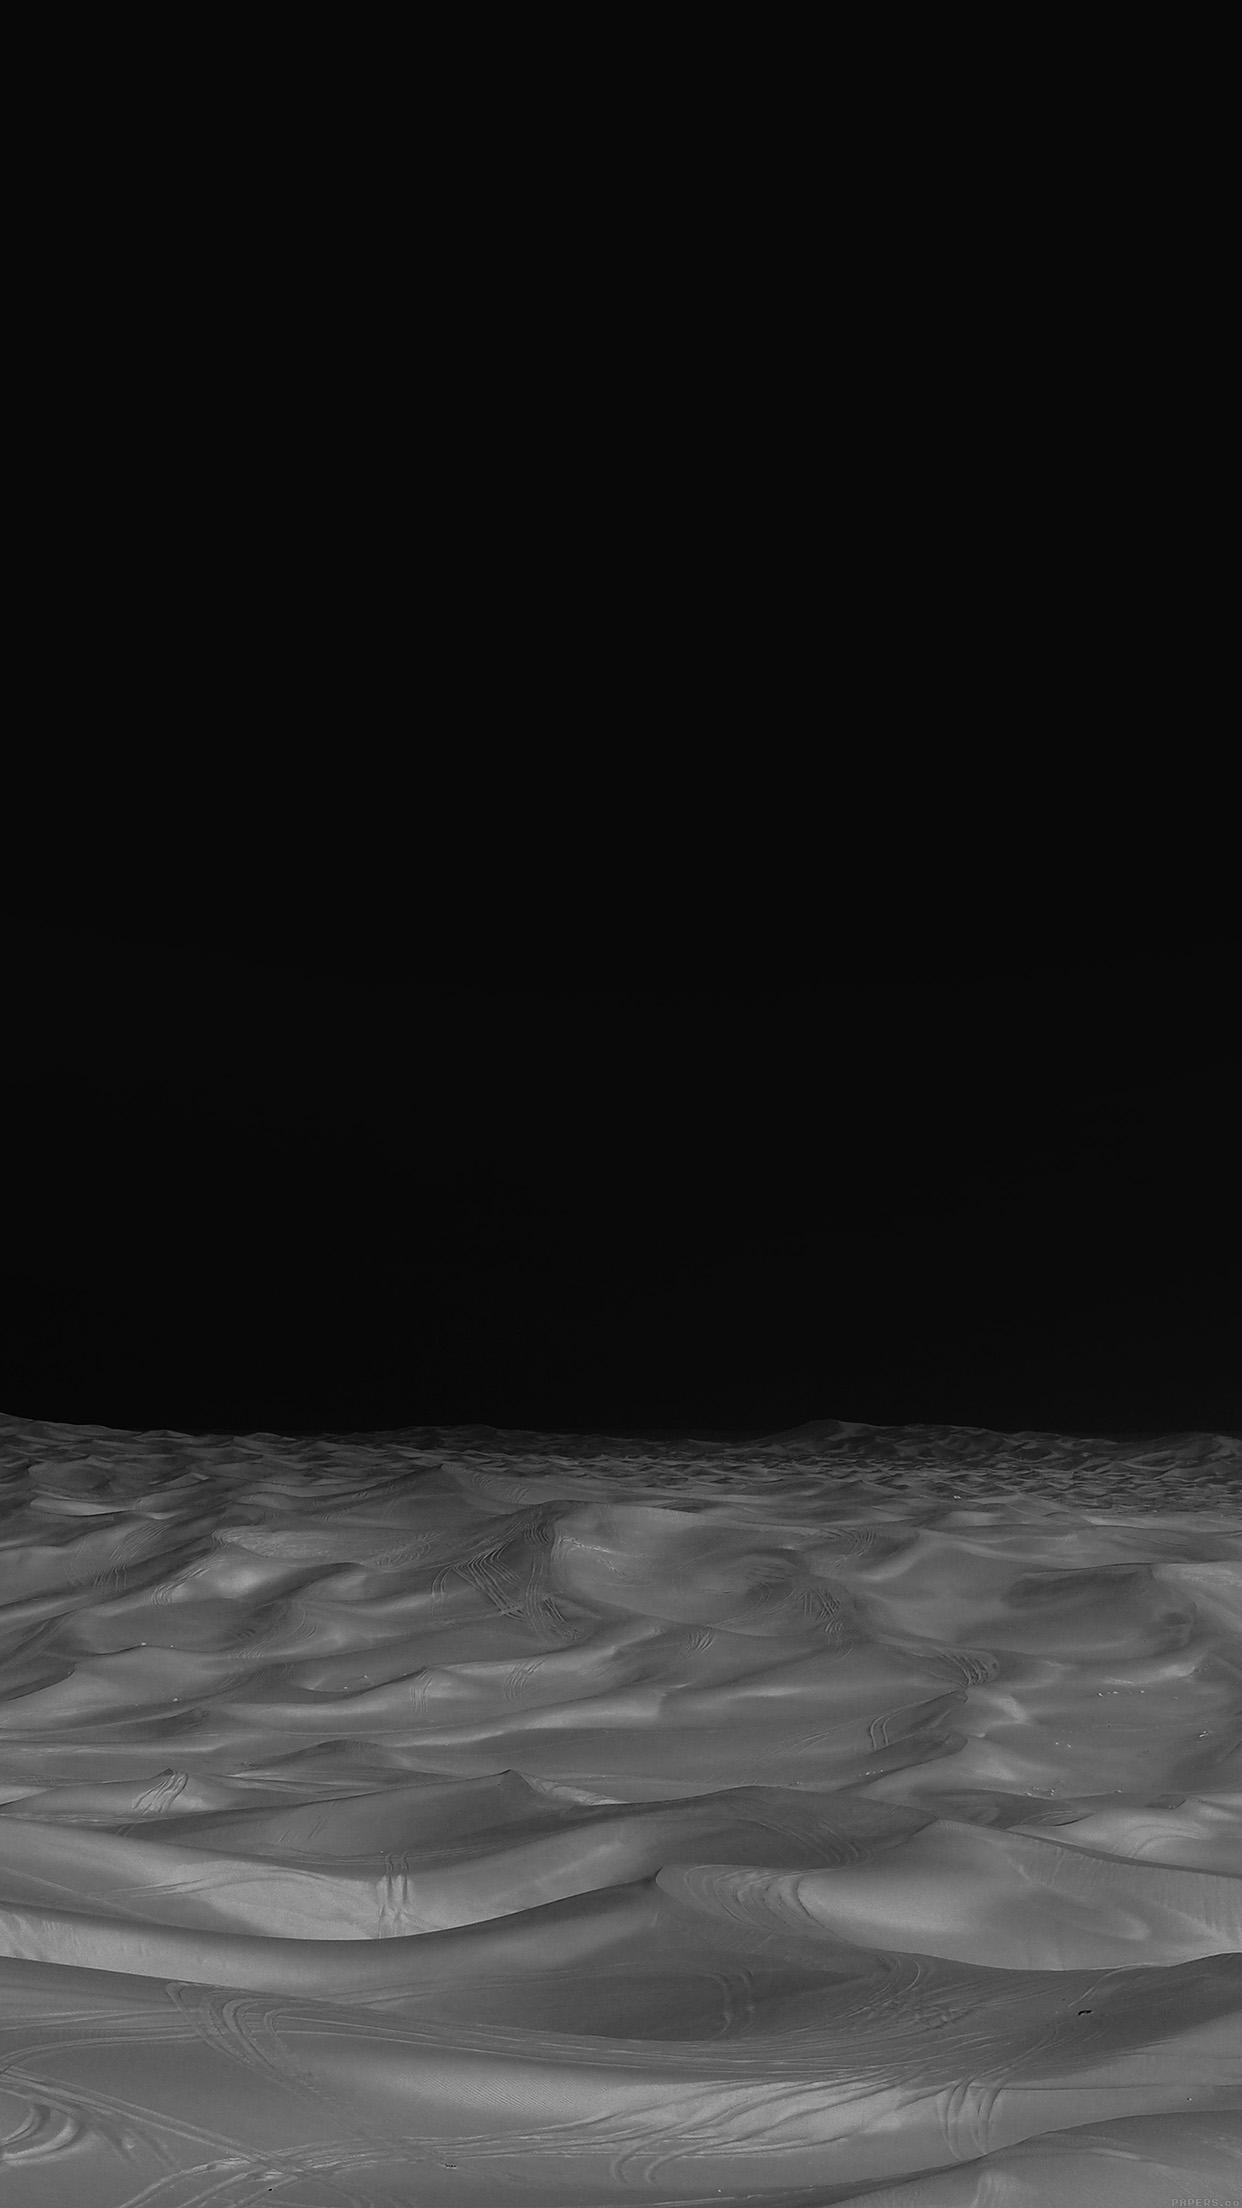 Desert Minimal Dark Black Nature Sky Earth Android Wallpaper